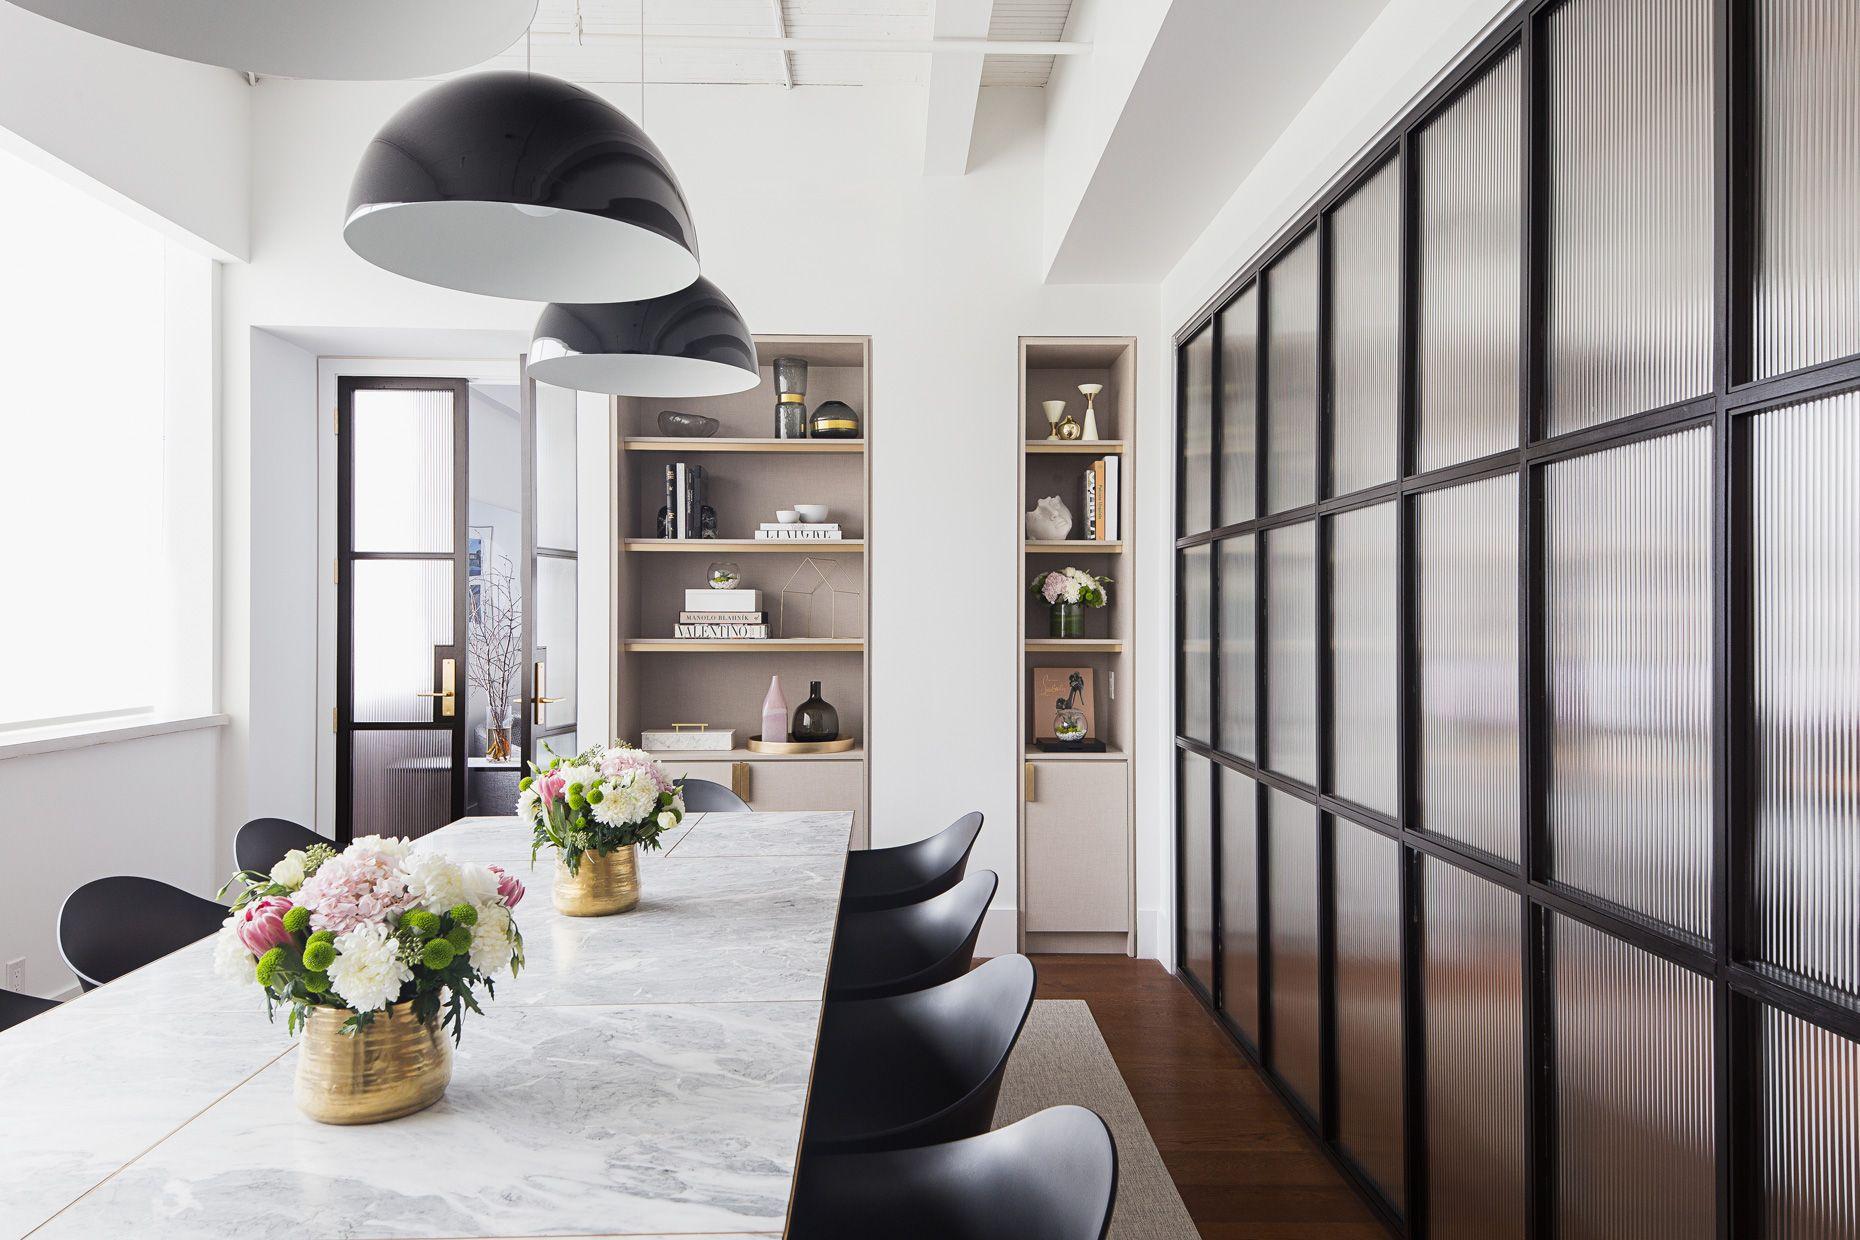 Toronto S Premier Architecture And Interior Design Firm Audax